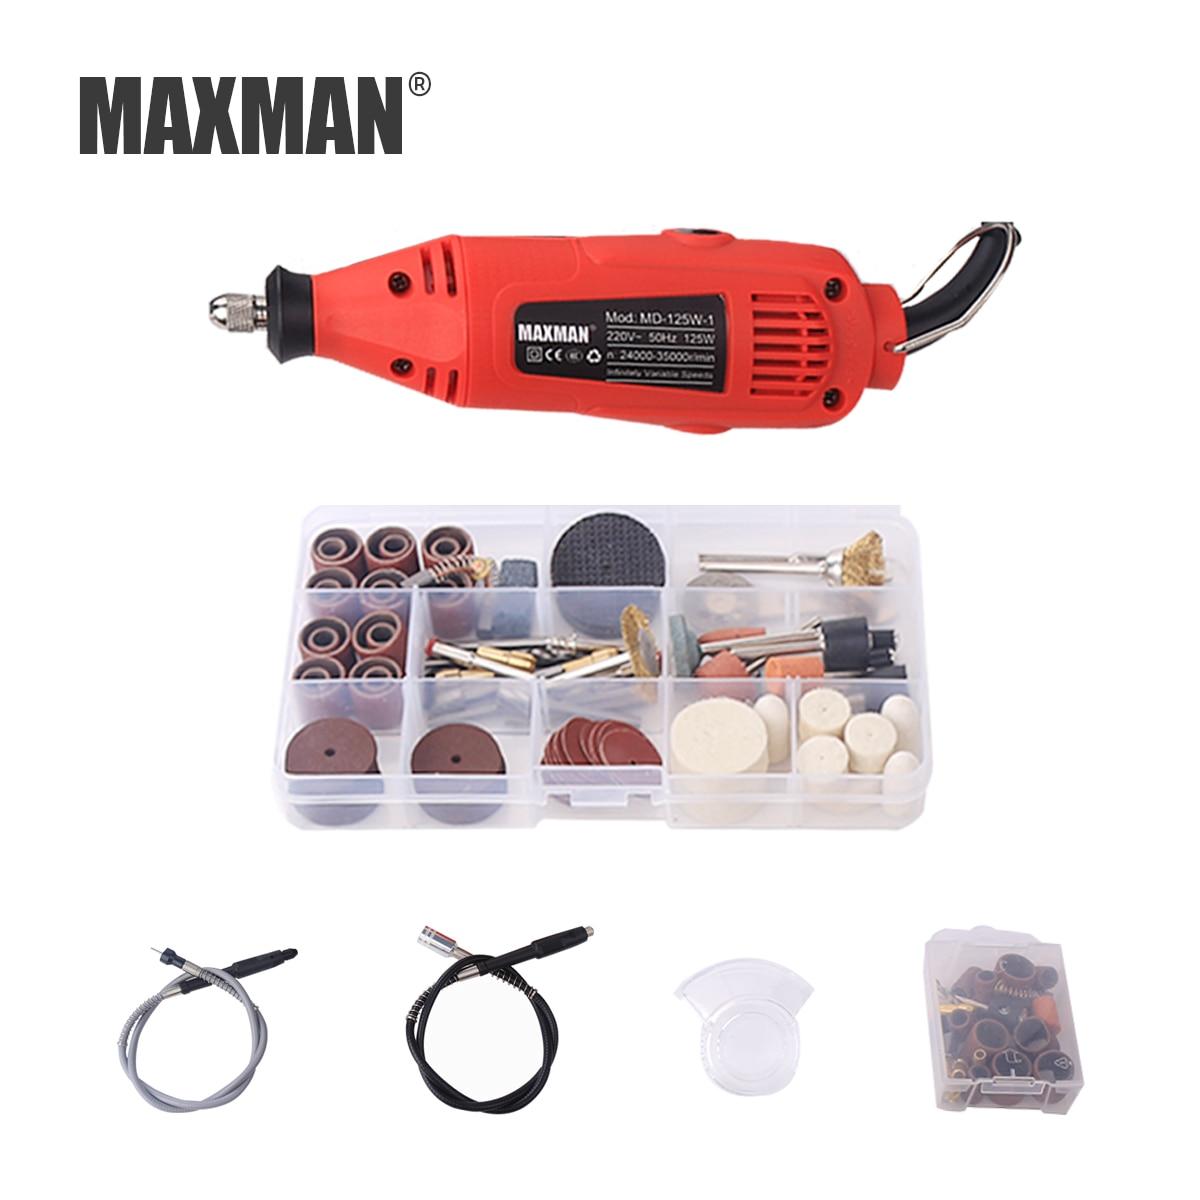 цена на MAXMAN Dremel 125W Engraving Pen Electric Drill DIY Drill Electric Rotary Tool grinder Mini Drill Mini-mill Grinding Machine